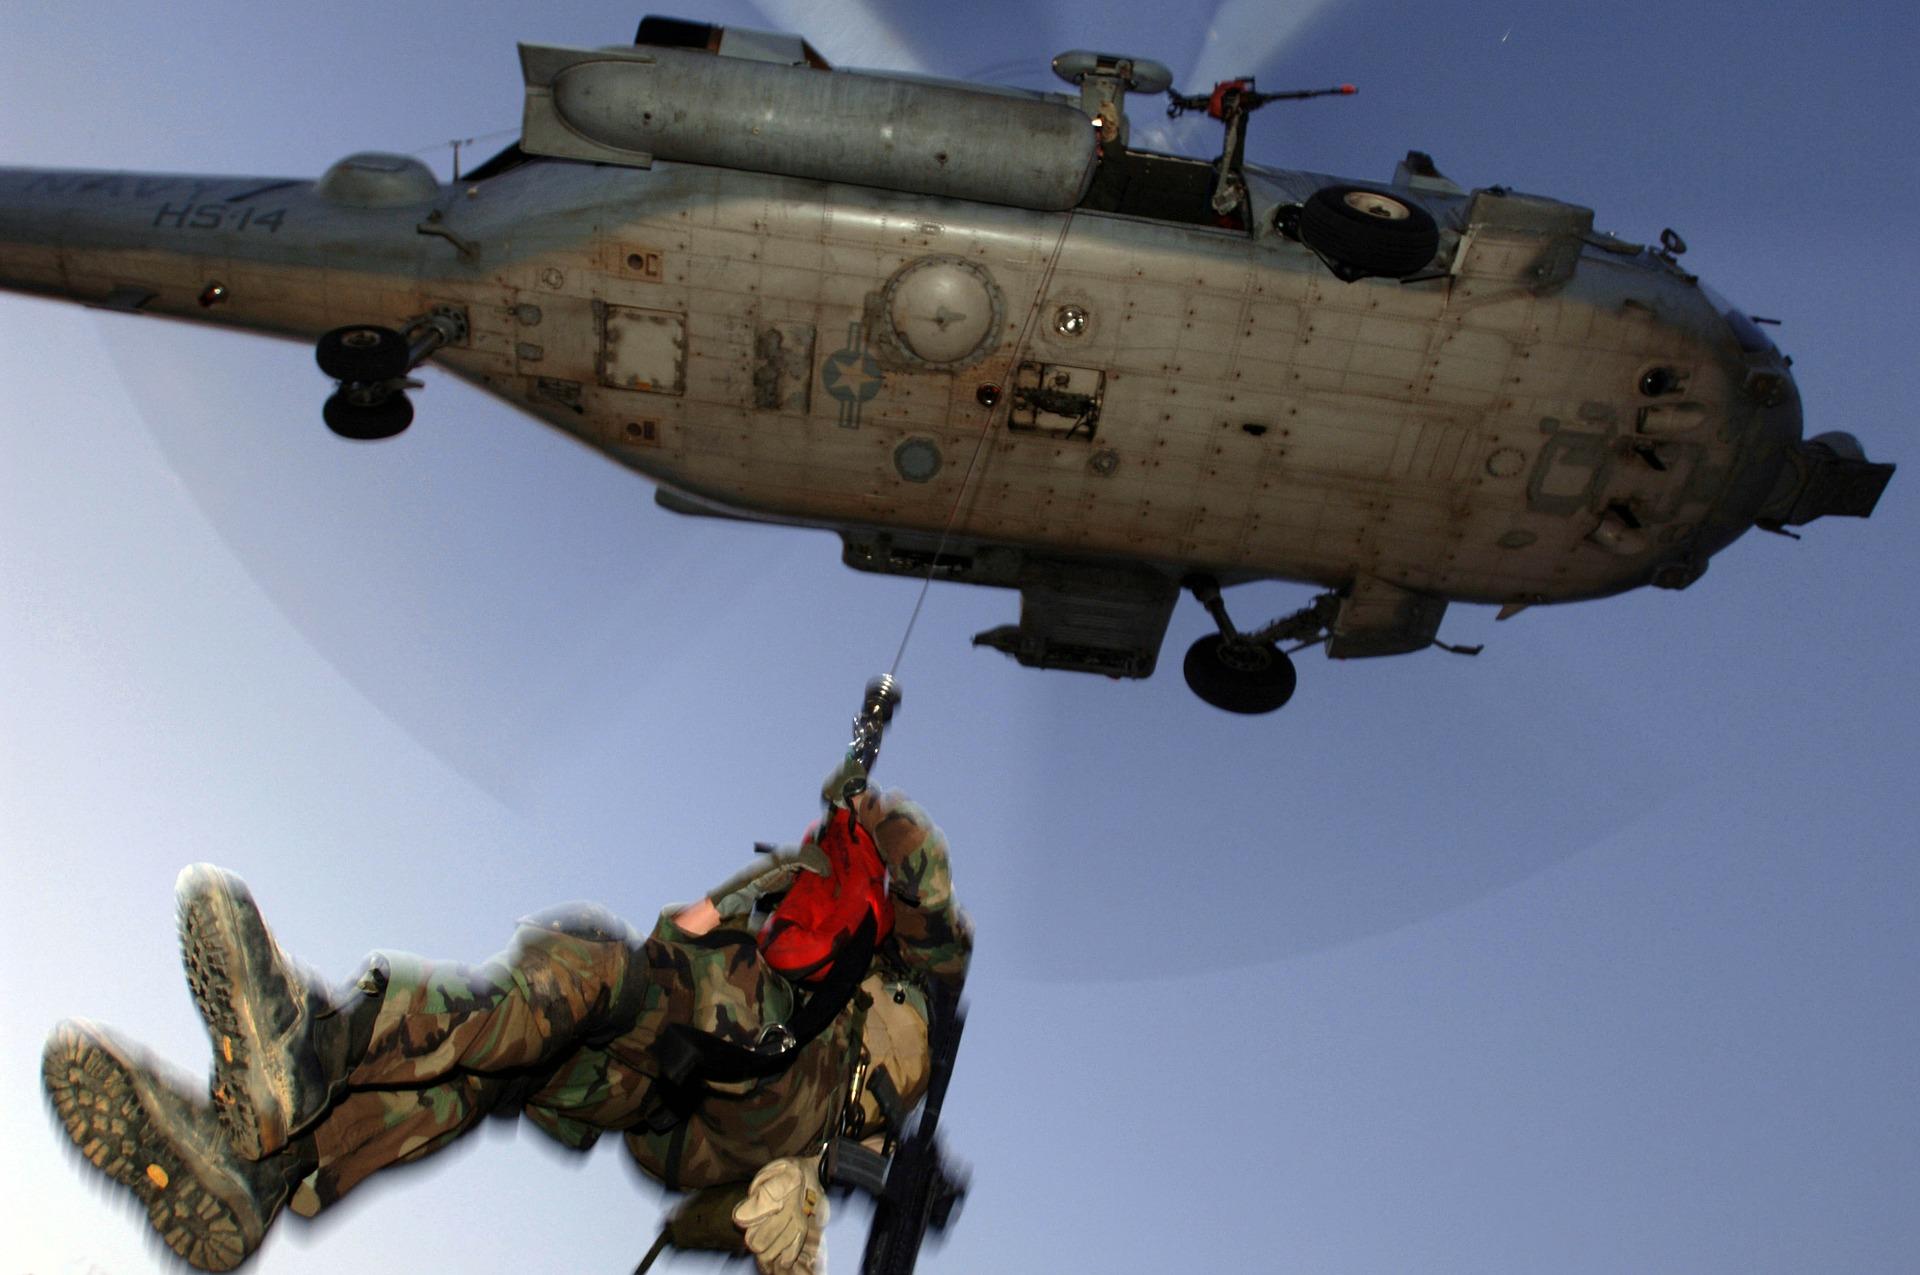 Angel, rescue helicopter, navy chopper, aviation slang, pilot lingo